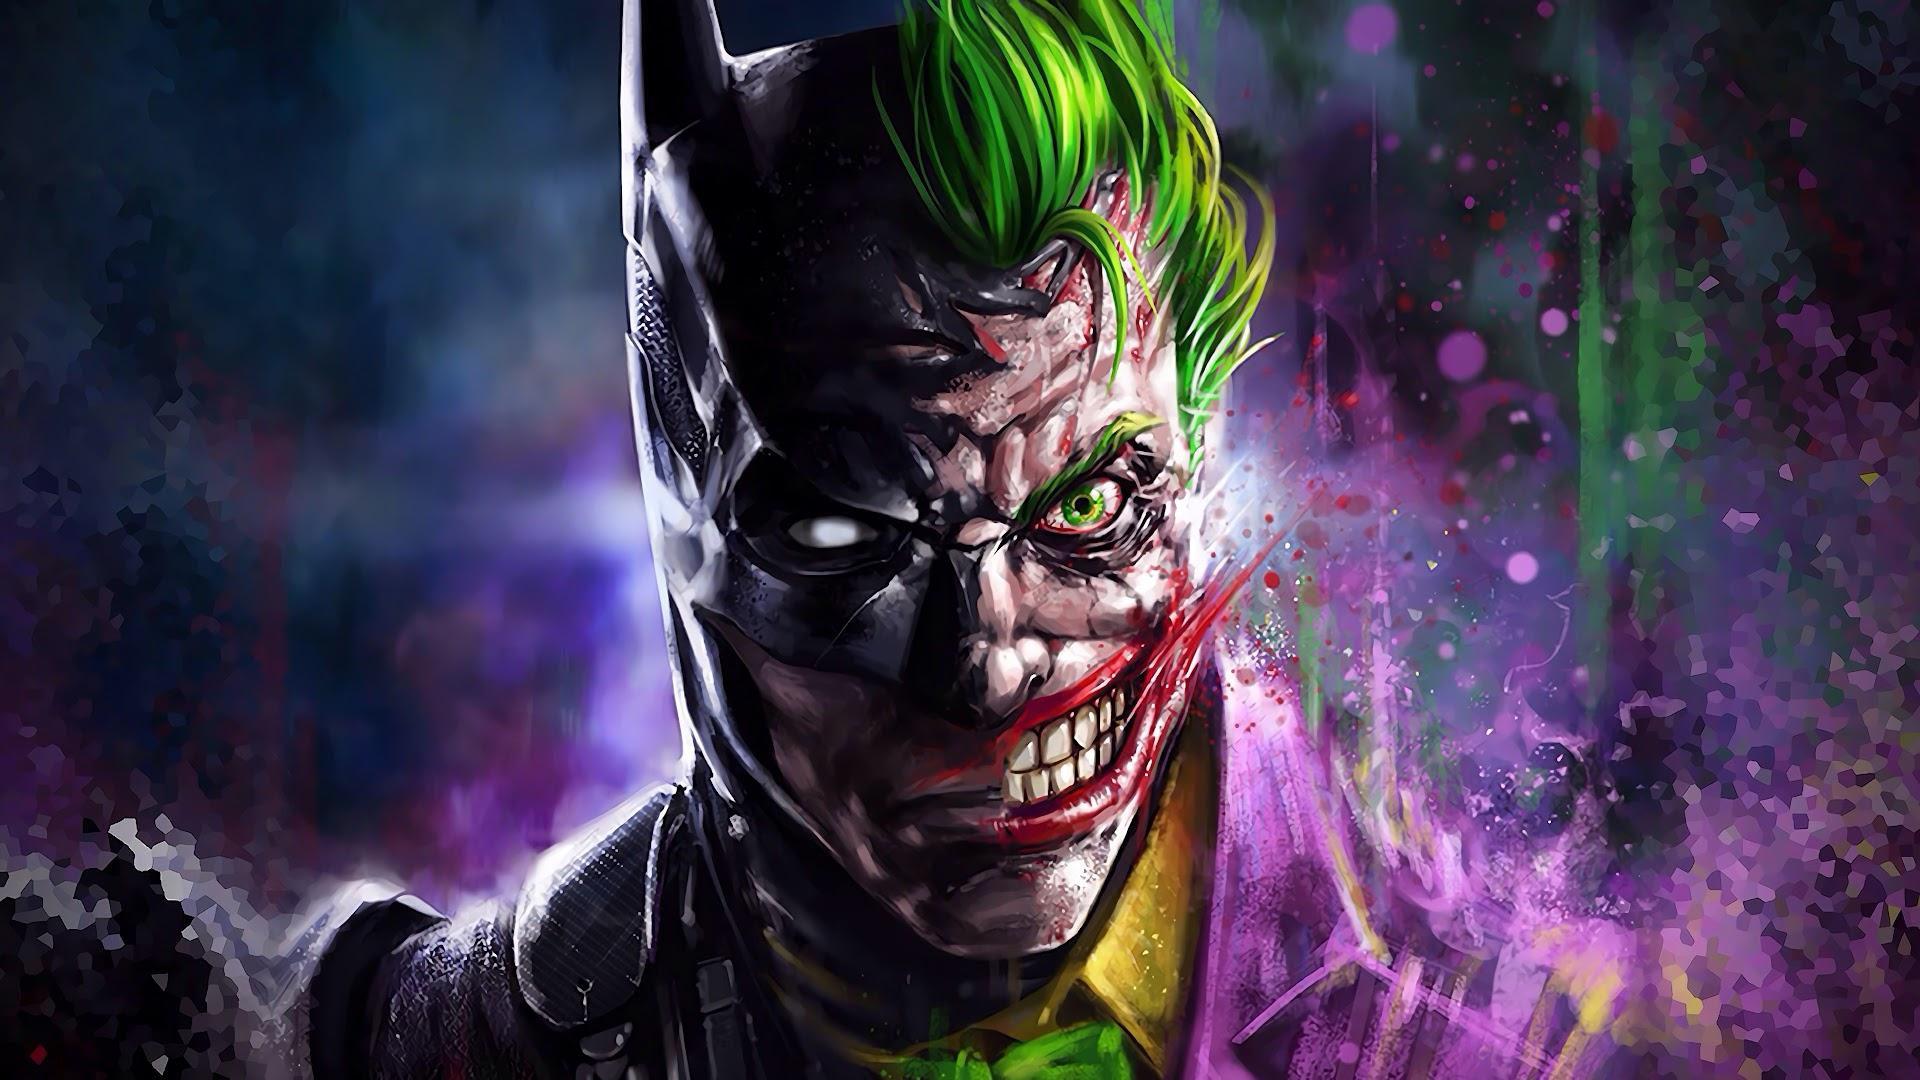 Batman Joker 4k Wallpaper 221